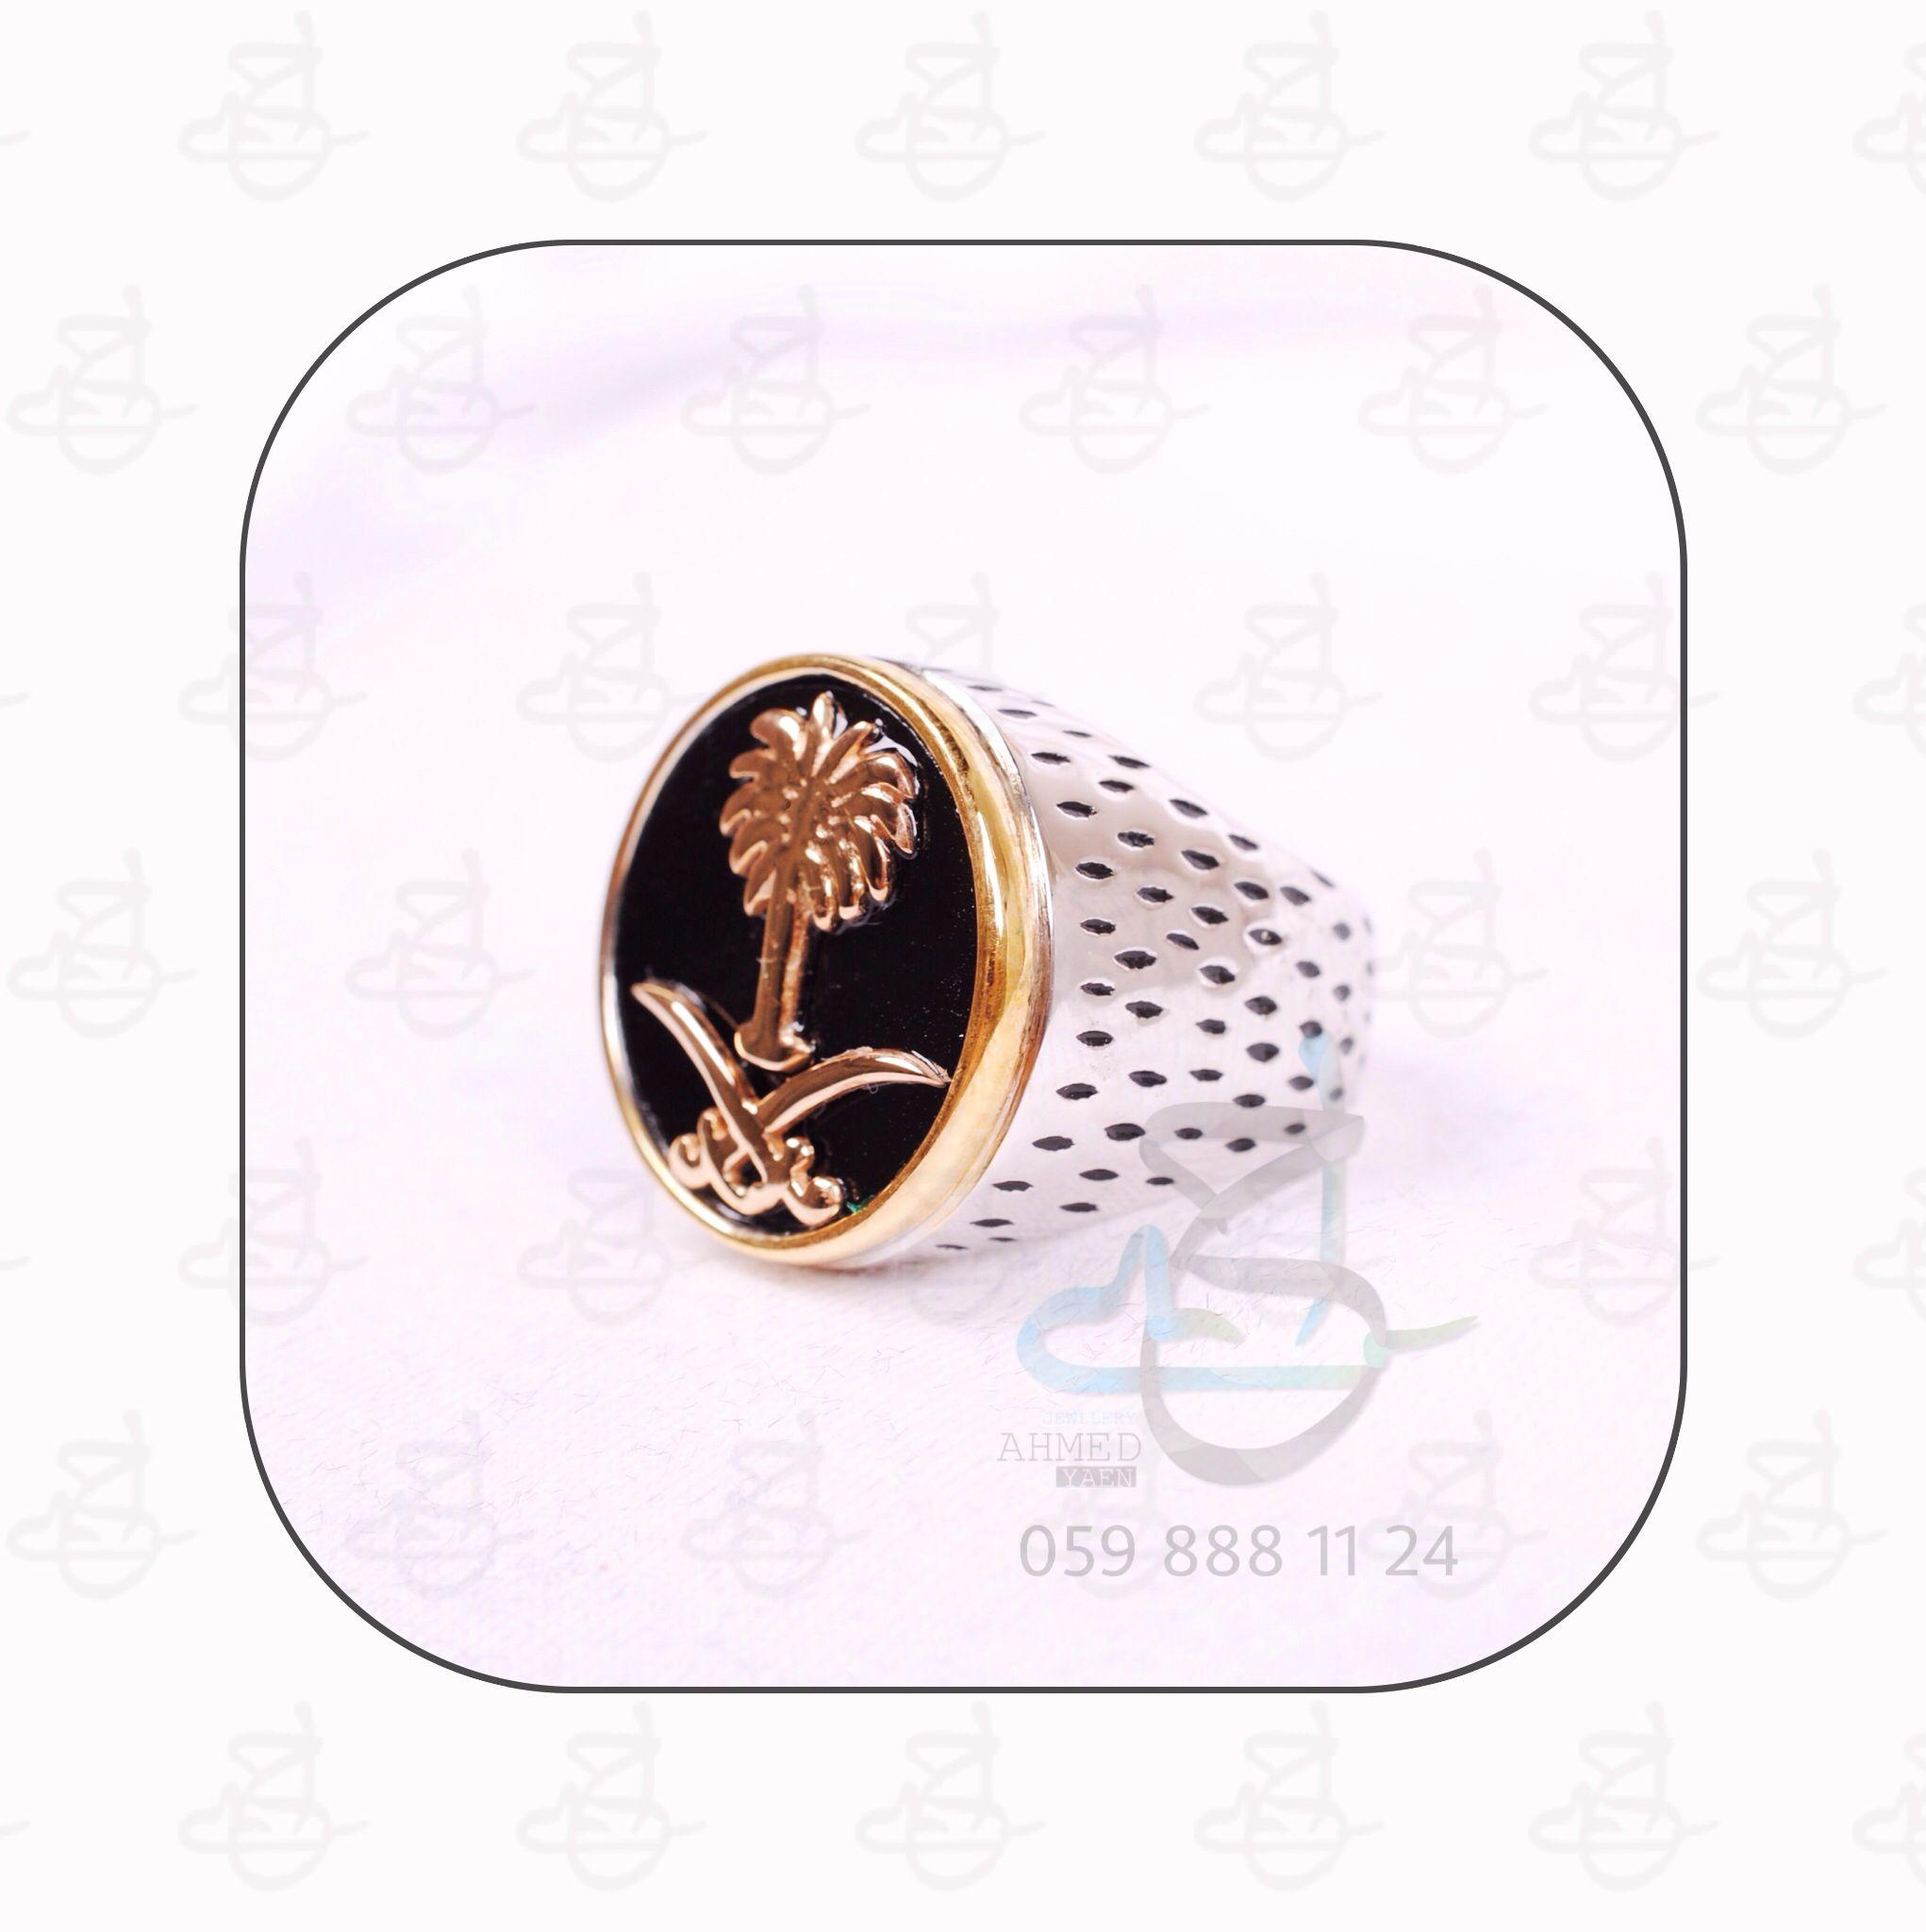 خاتم سيفين ونخلة Phone Ring Jewelry Electronic Products